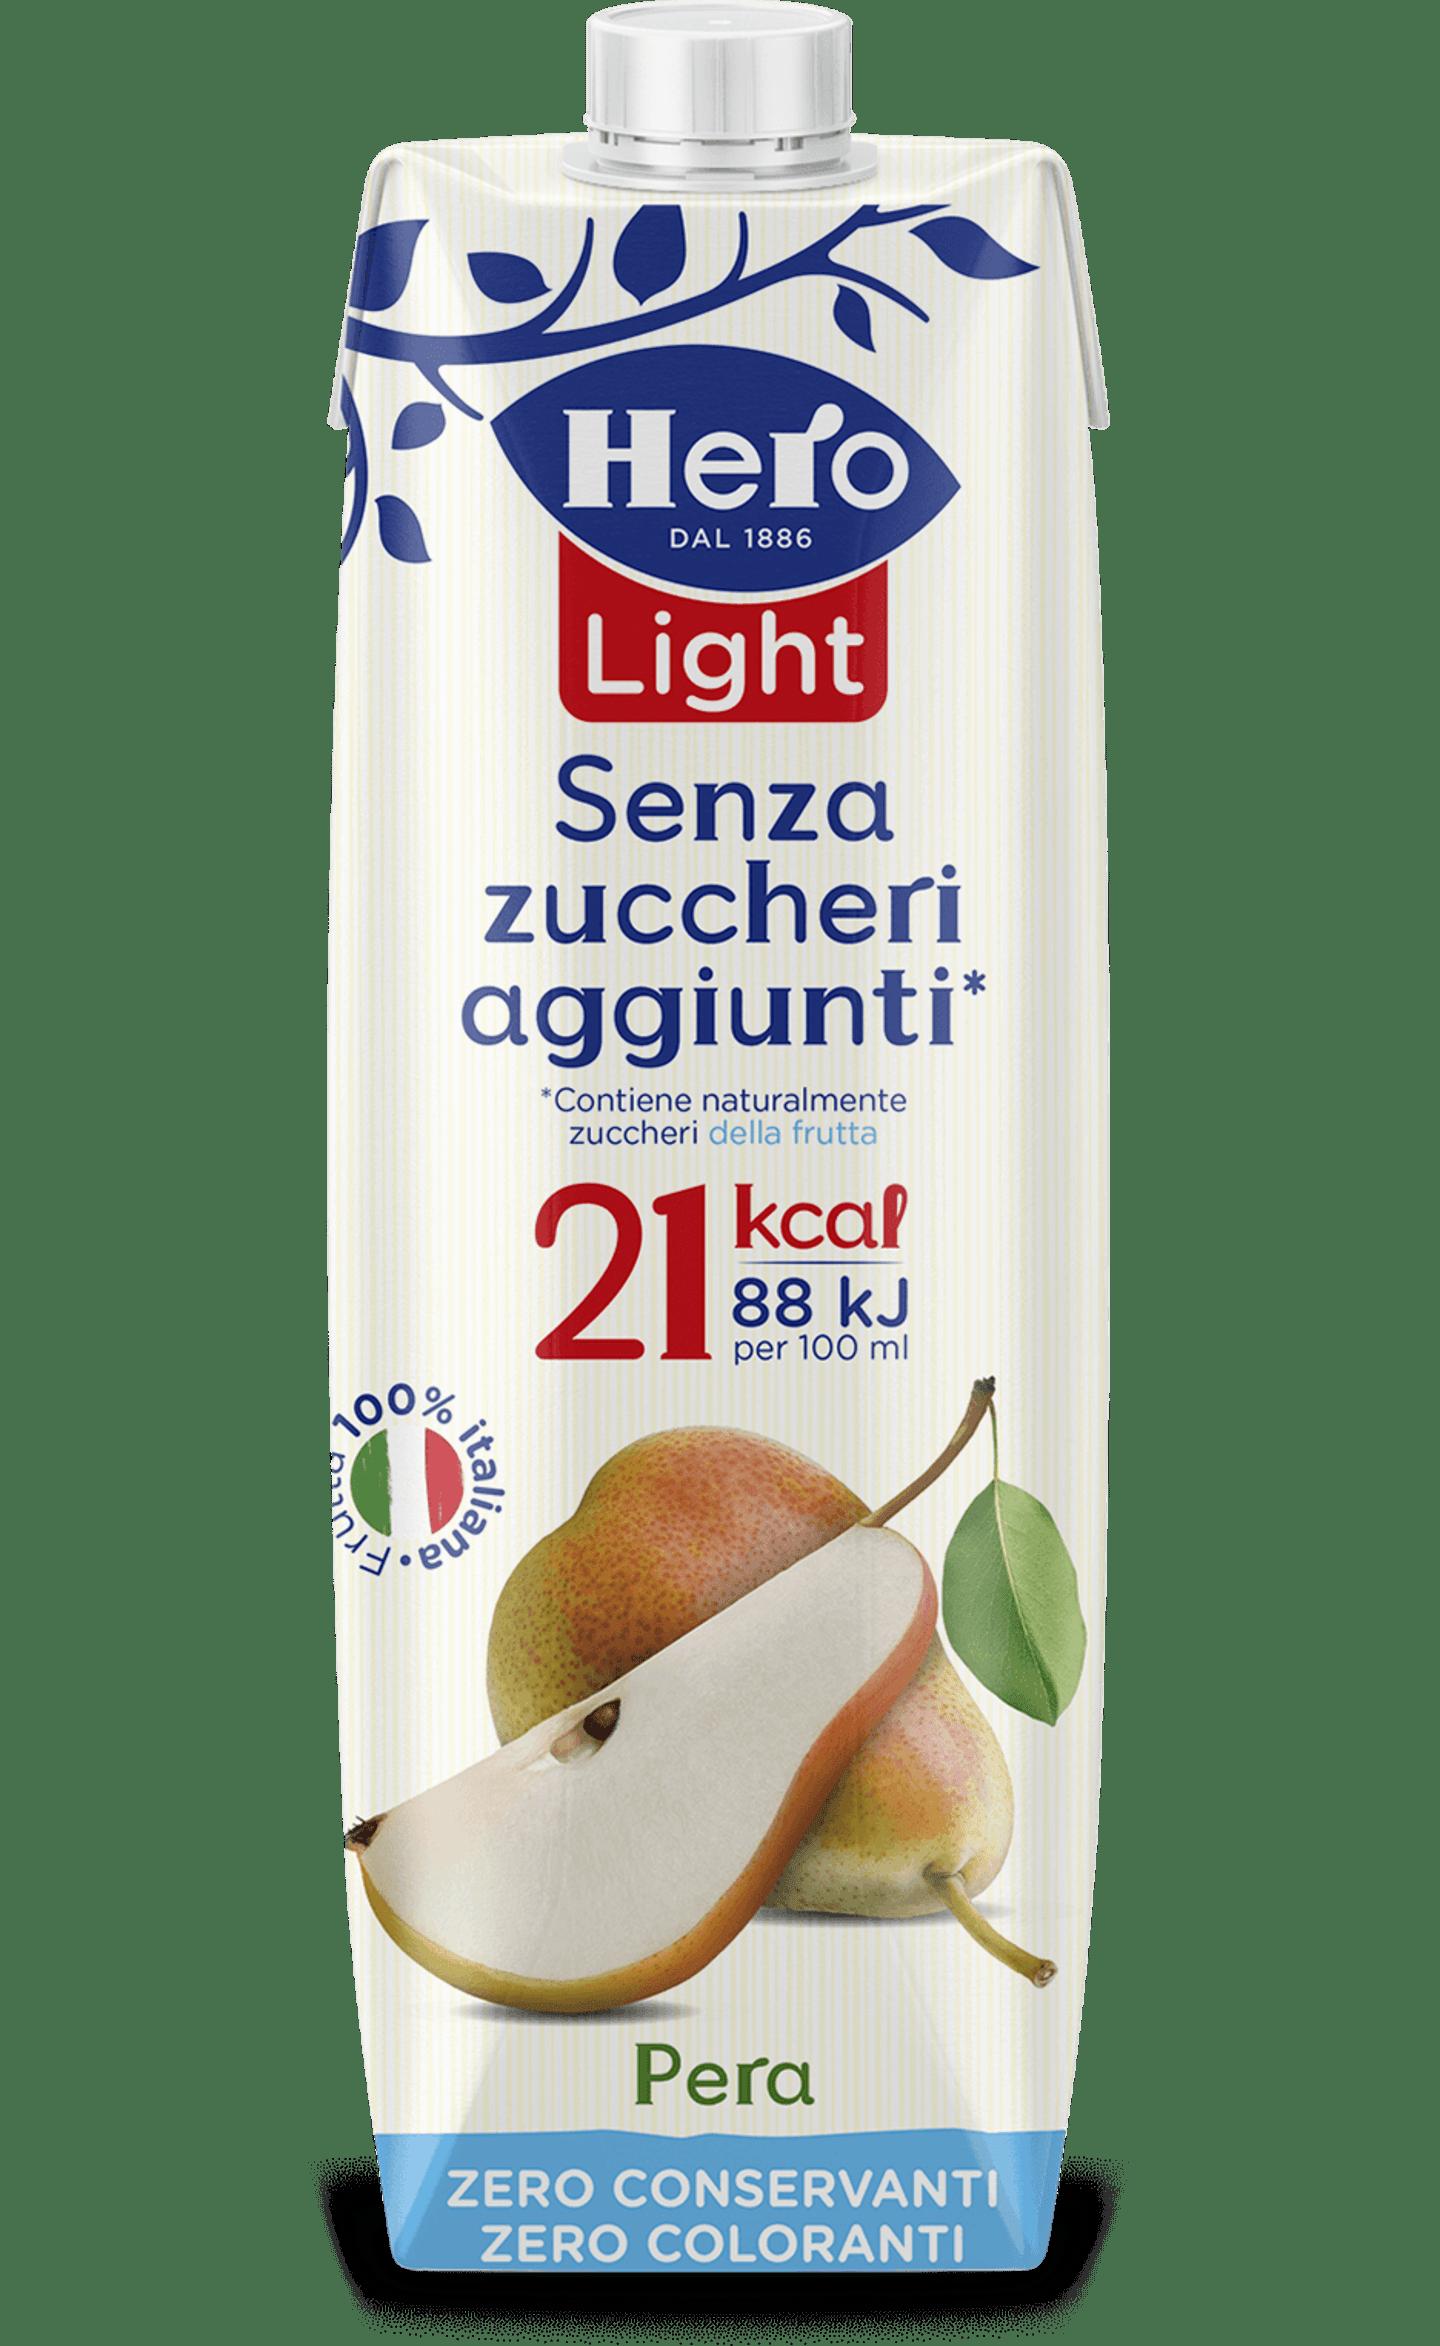 bevanda-light-hero-alla-pera